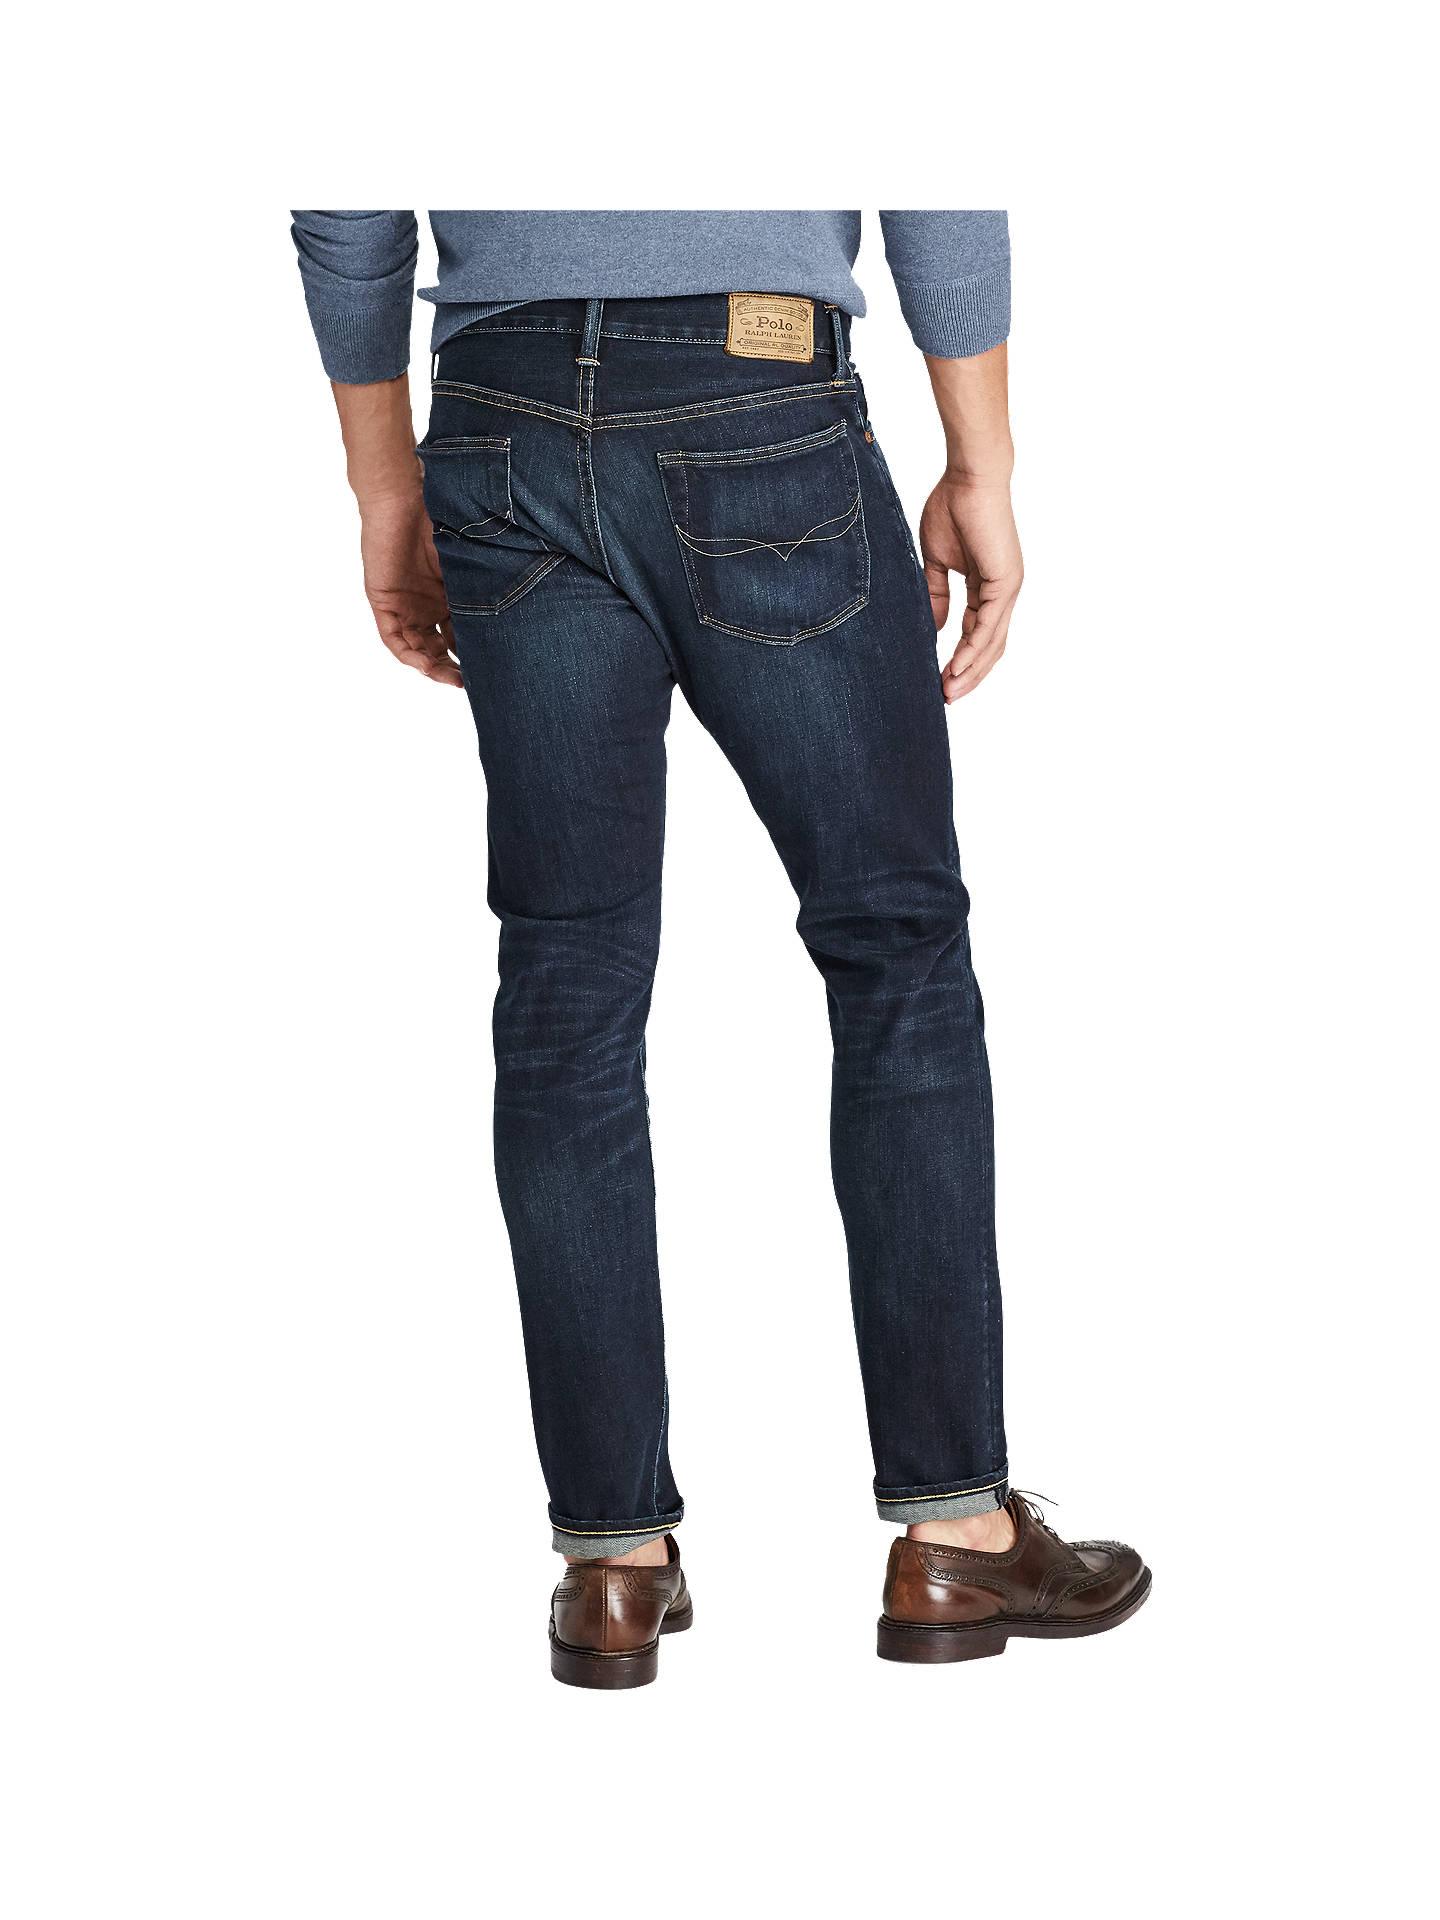 07e61a93 ... Buy Polo Ralph Lauren Sullivan Five Pocket Jeans, Murphy Stretch, 32R  Online at johnlewis ...